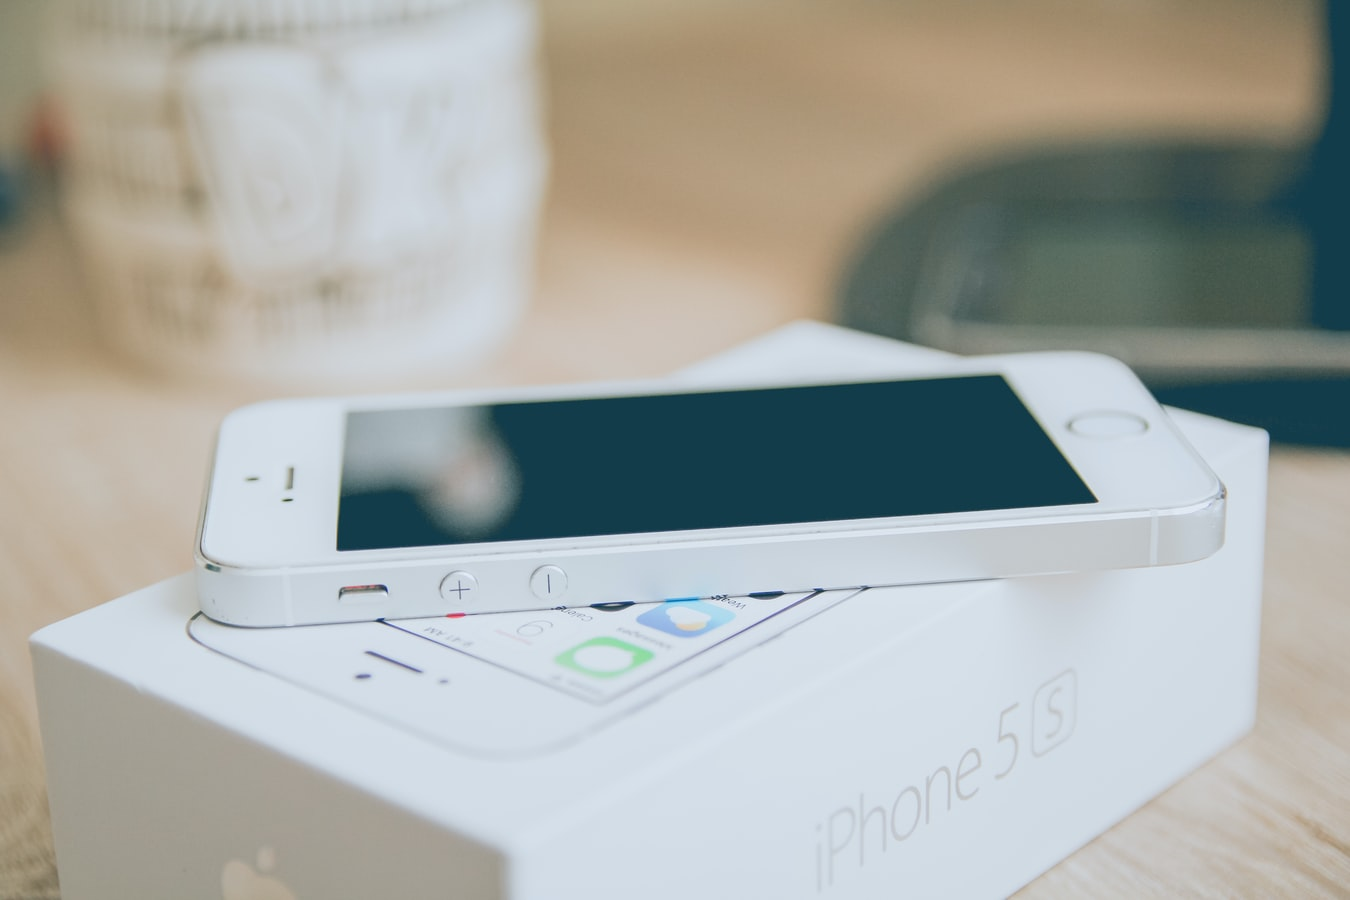 Iphone med kartong